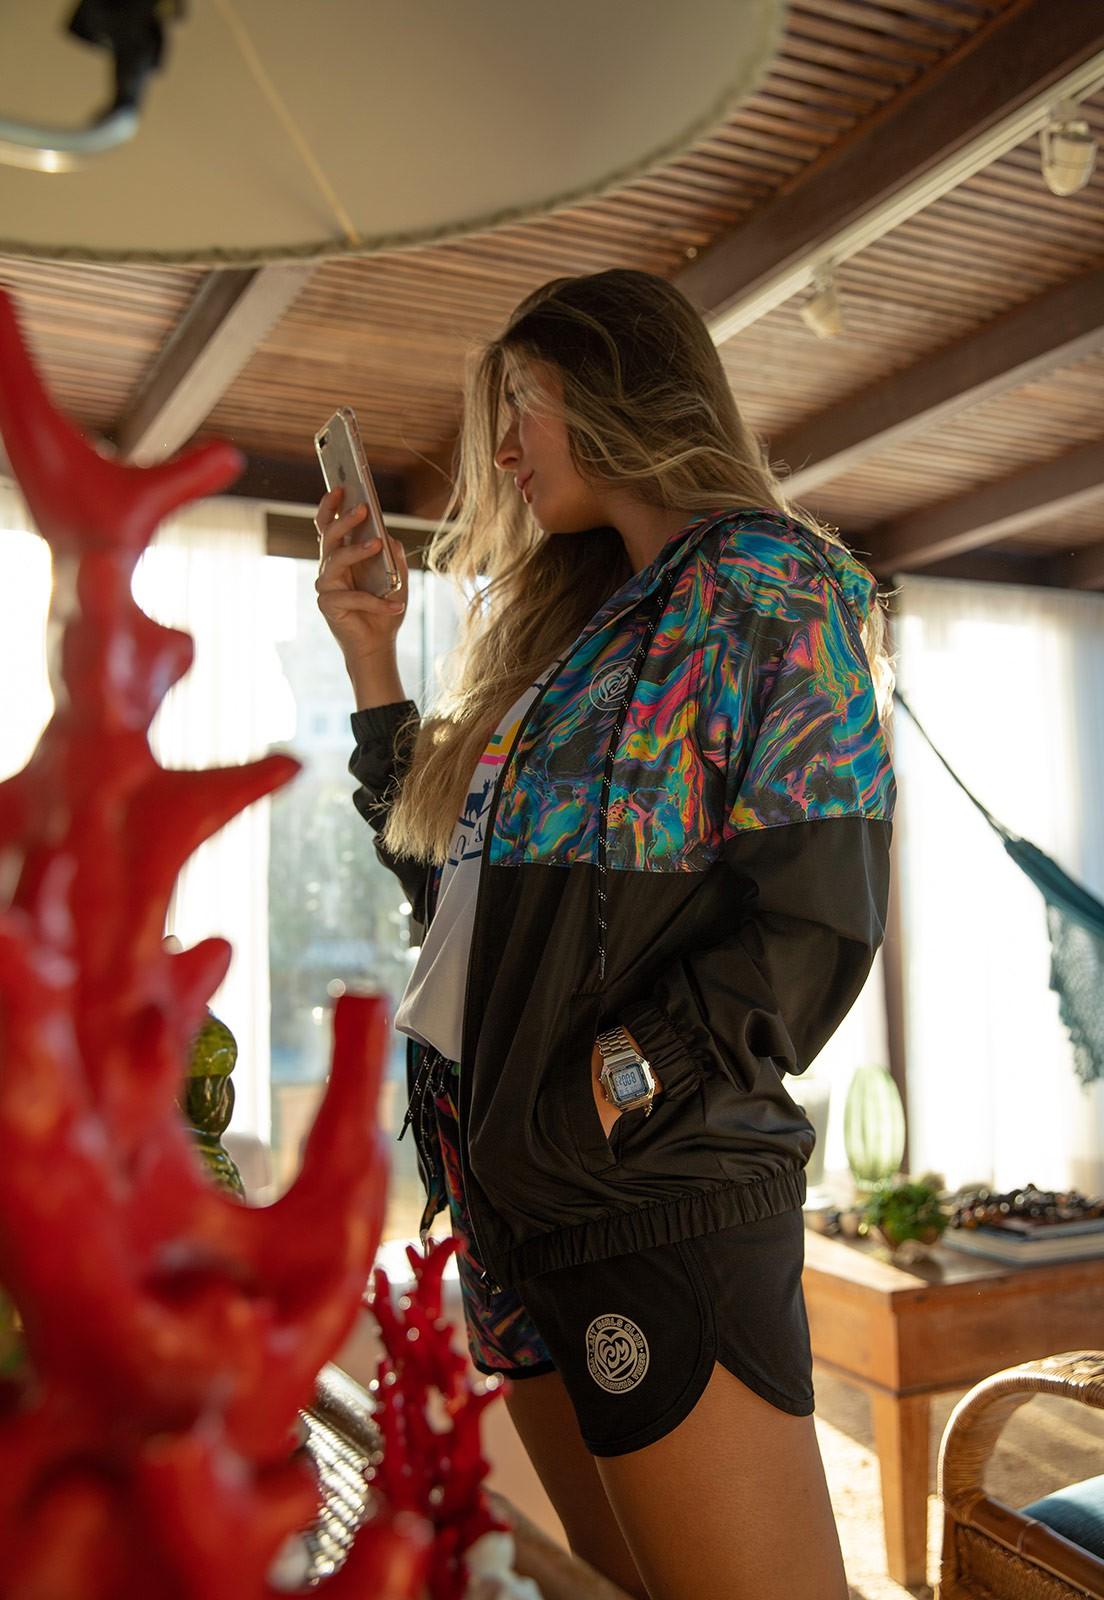 Jaqueta Vida Marinha Corta Vento Preto/Tie Dye